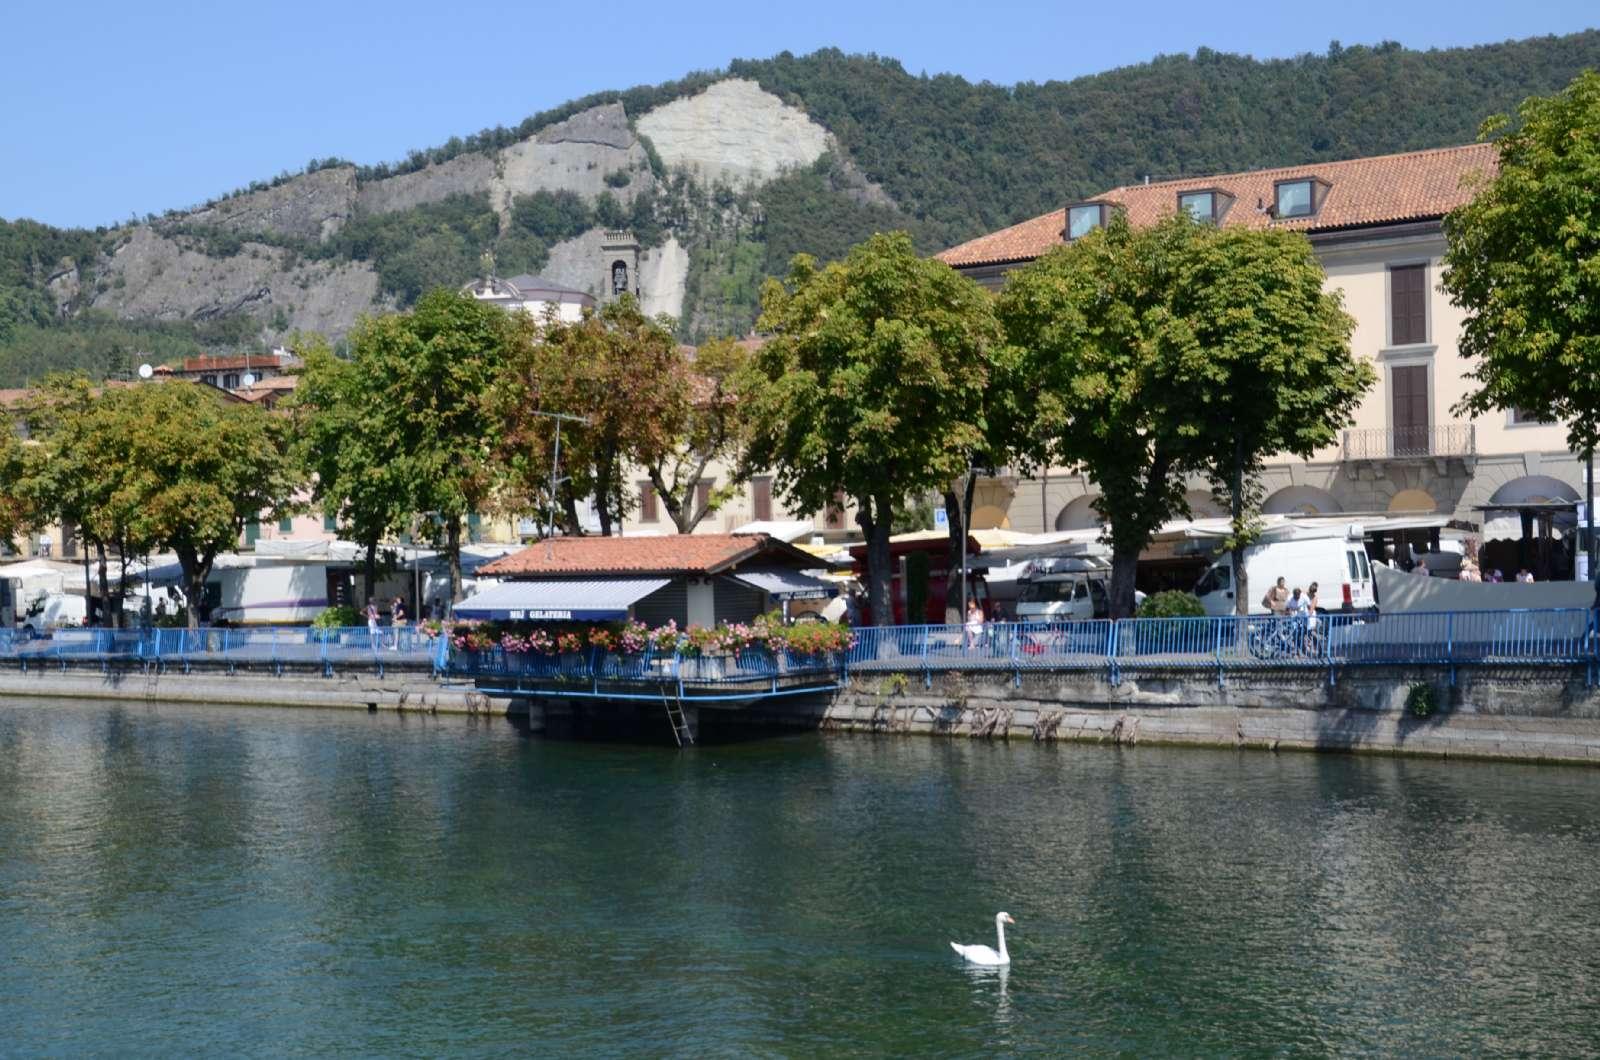 Promenade au bord du lac à Sarnico